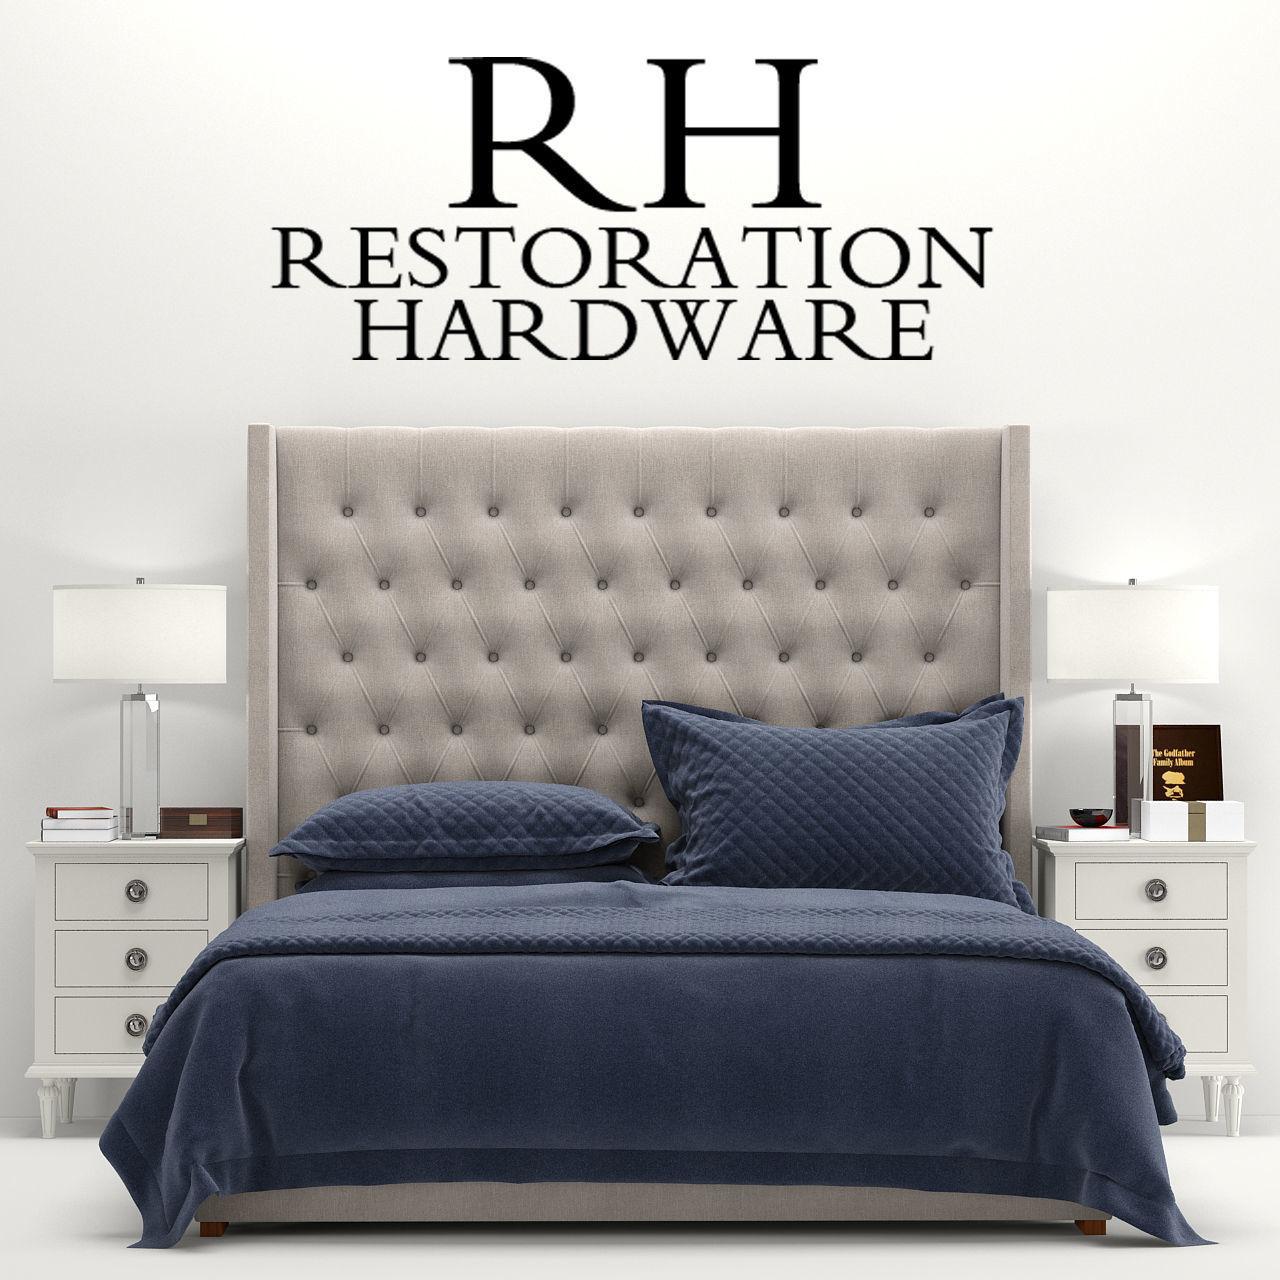 3d Rh Adler Tufted Fabric Bed Cgtrader